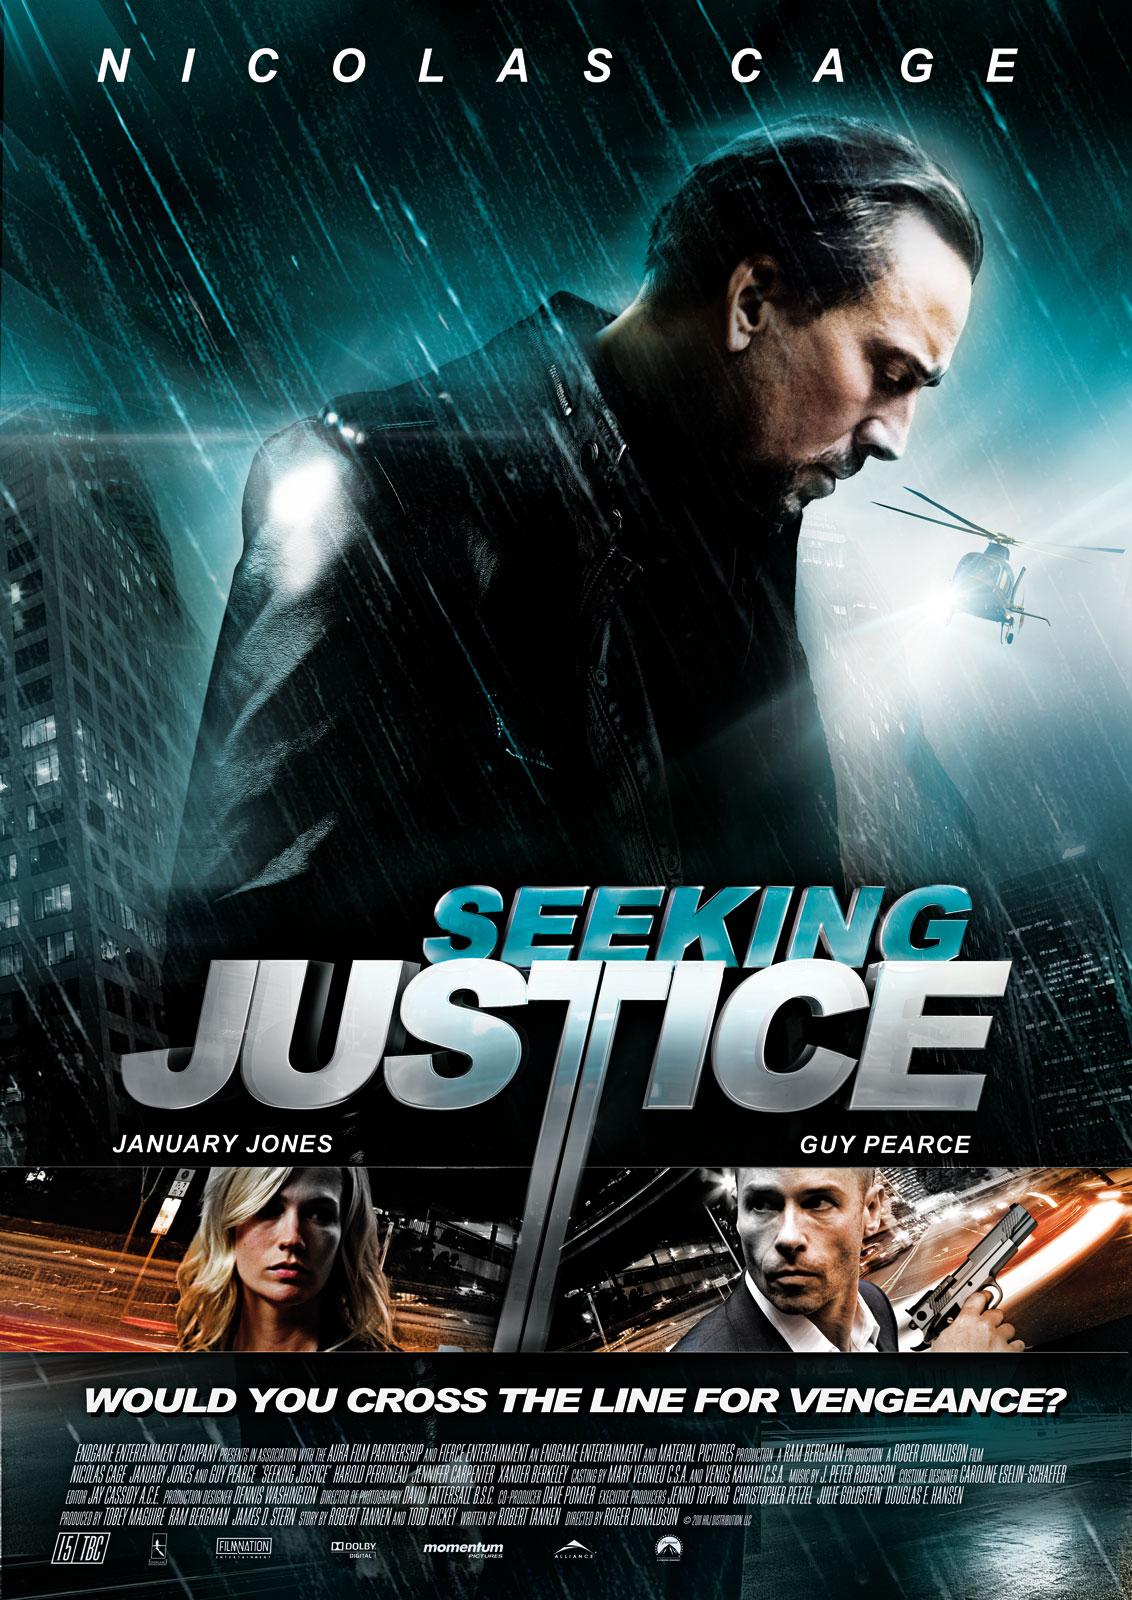 Seeking Justice ทวงแค้น ล่าเก็บแต้ม [HD][พากย์ไทย]